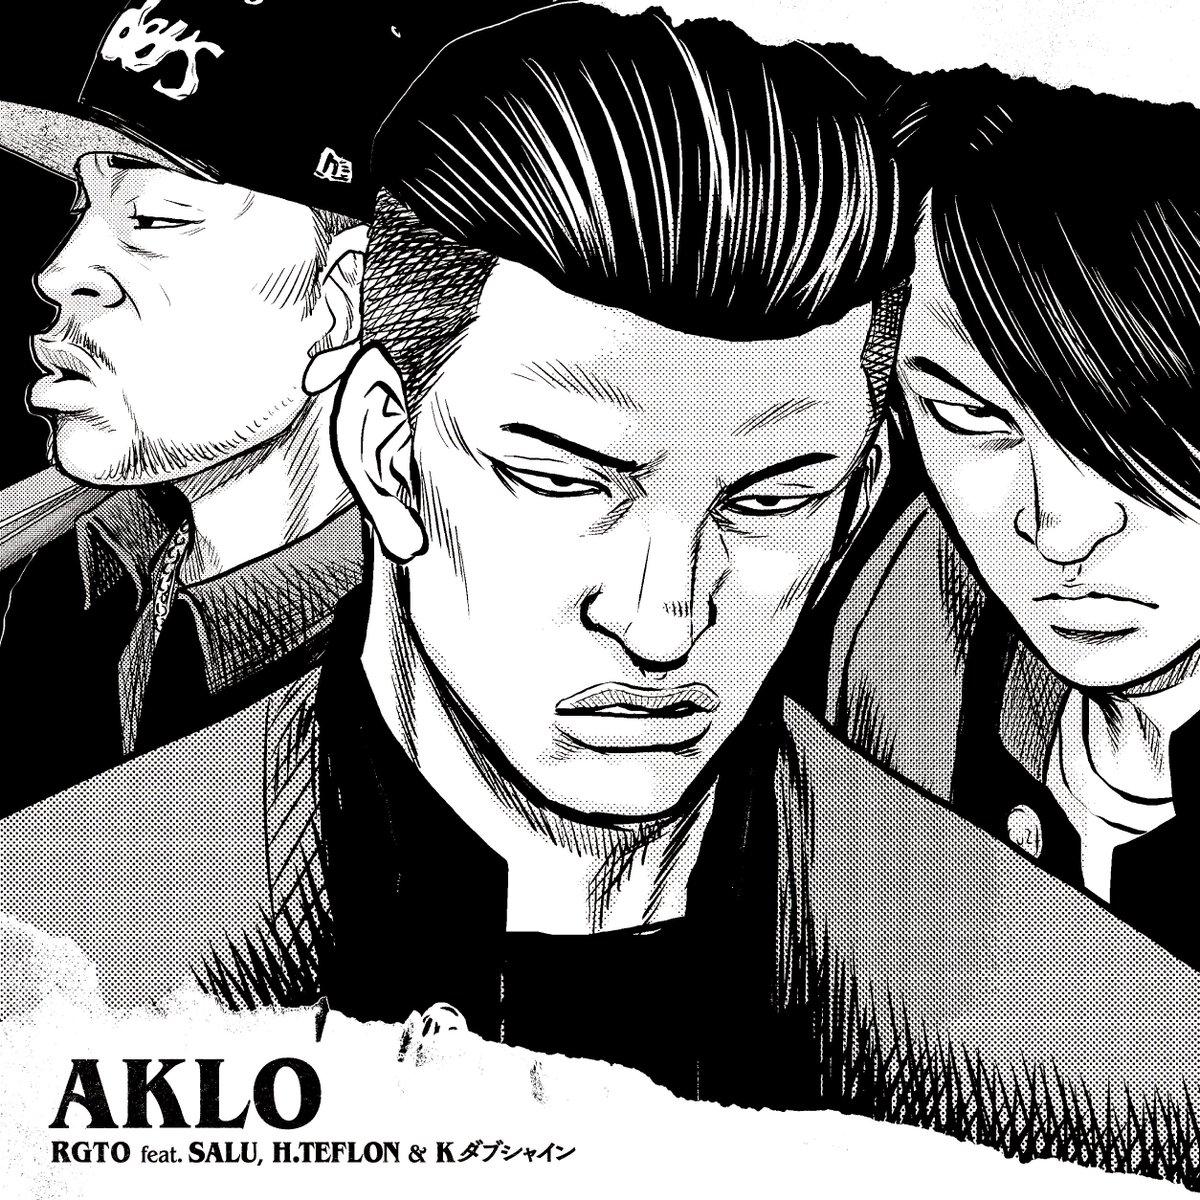 "AKLO ""RGTO ft. SALU,H.TEFLON & Kダブシャイン"" 7inch JKT公開!! 漫画""ドロップ"" ファン、ヤンキーファンもマストアイテム 4/27(水)発売 https://t.co/4wUQzxsFGB https://t.co/G96TkXafQT"